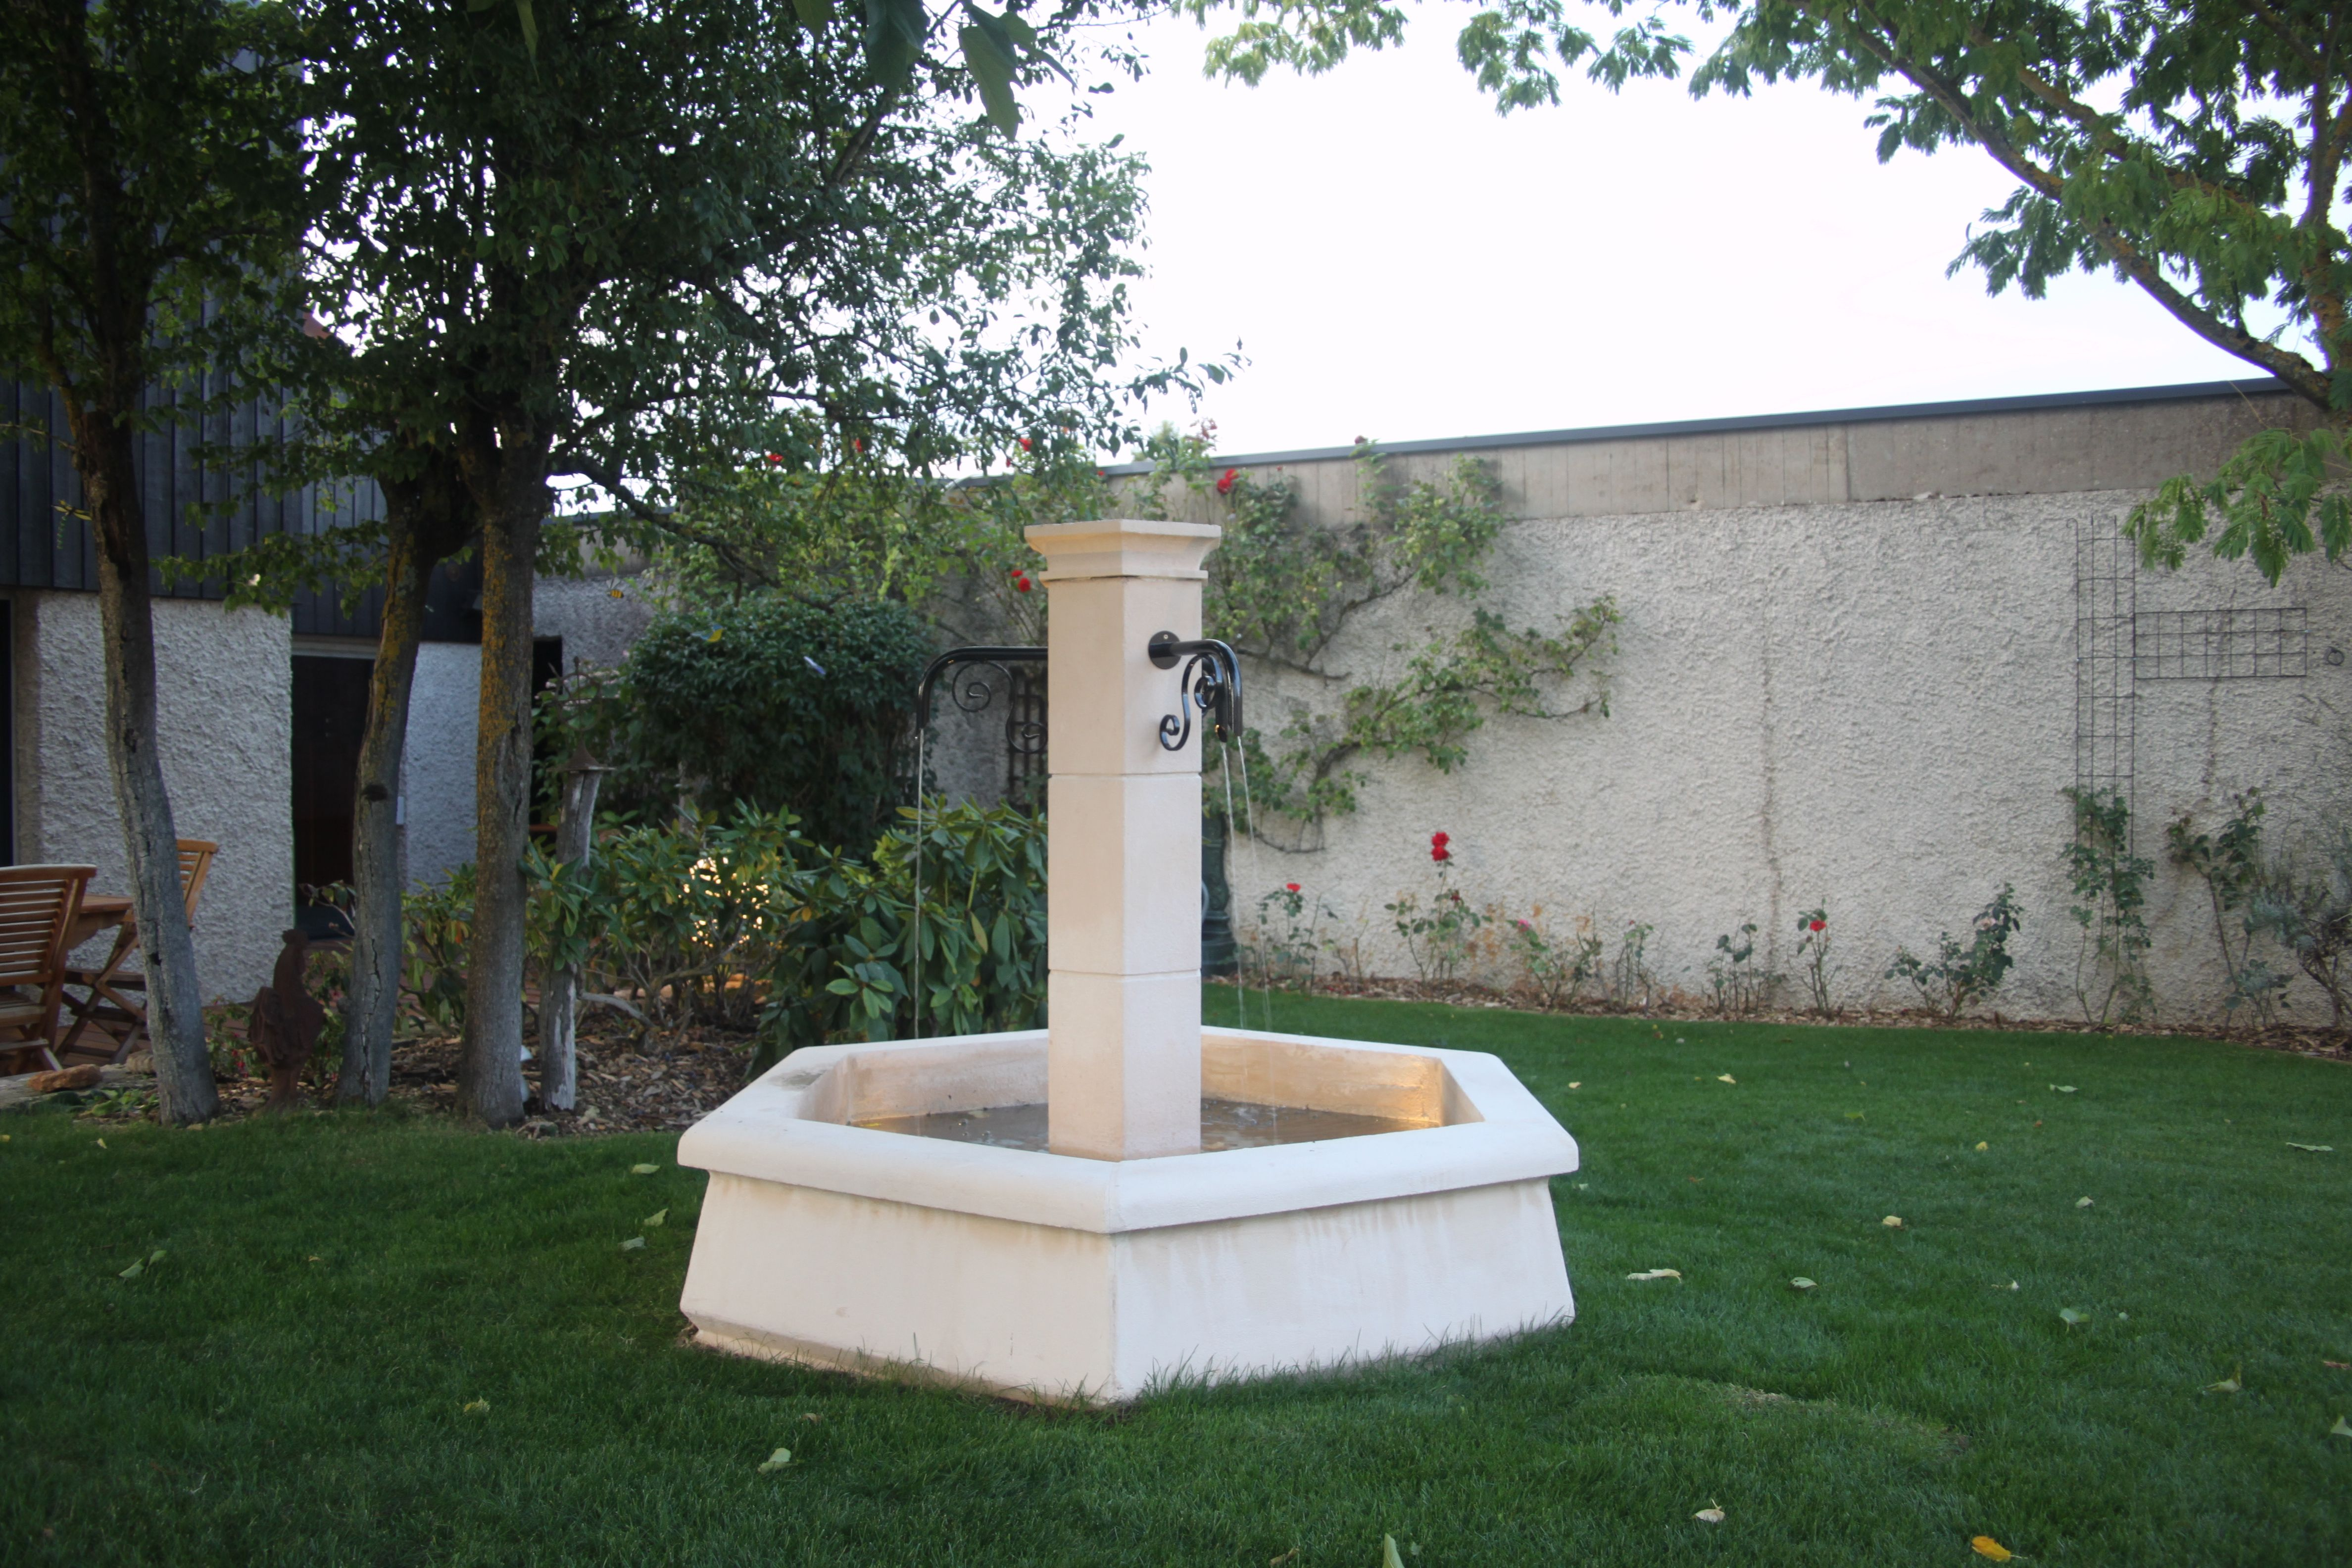 Petite Fontaine Centrale De Village Ou Jardin En Pierre Reconstituee Diametre De Bassin 1 5 M L Ensemble Avec Petites Fontaines Pierre Reconstituee Jardins